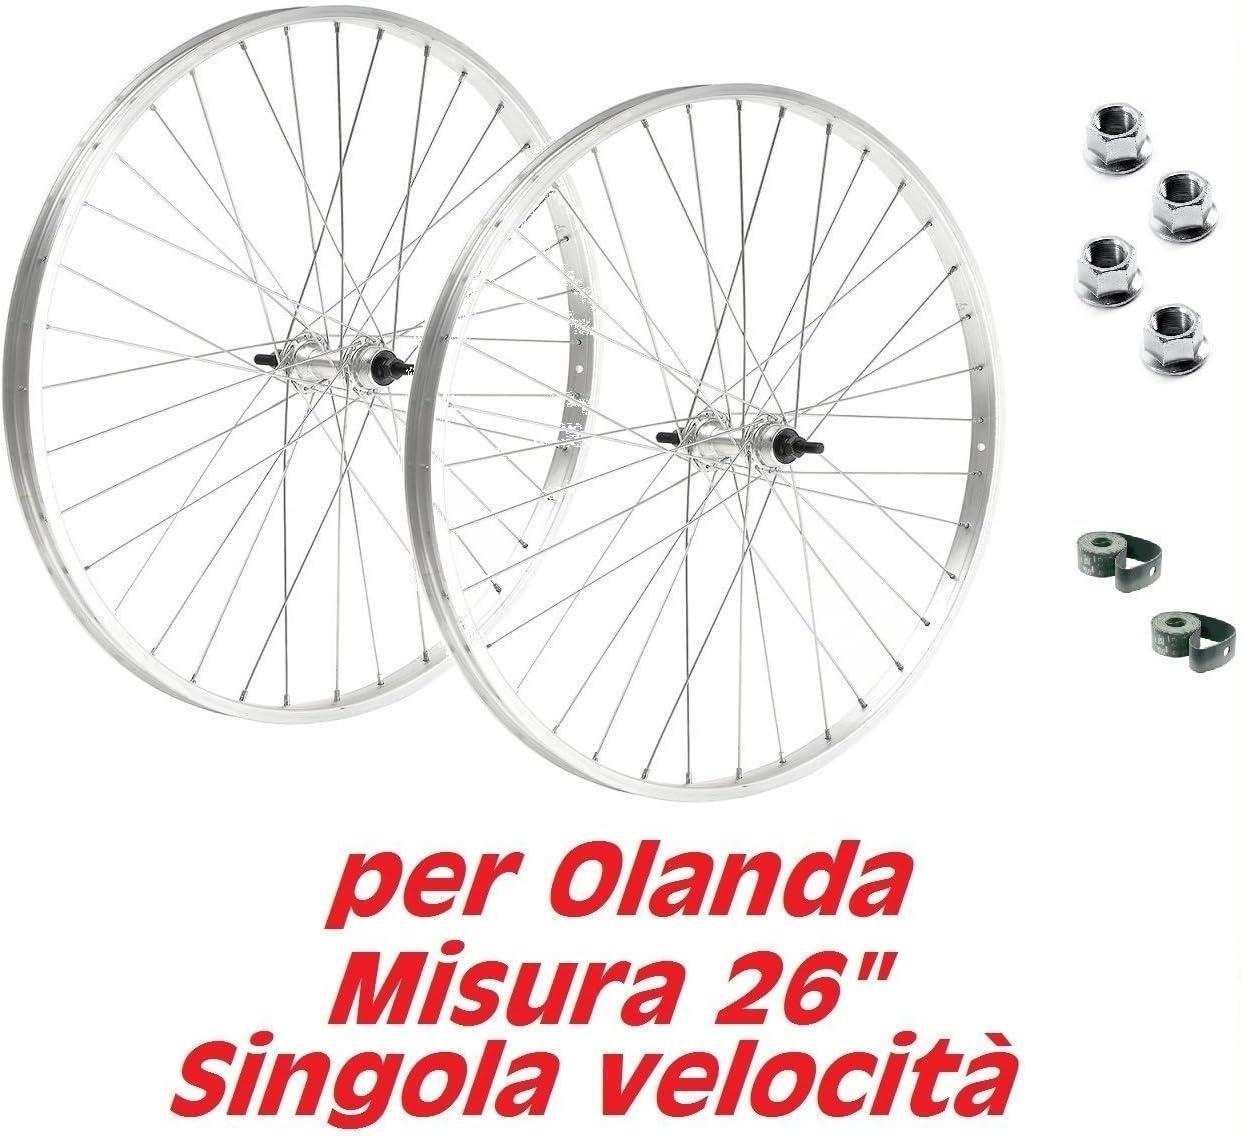 Par de ruedas para bicicleta holandesa, bicicleta clásica, tamaño ...